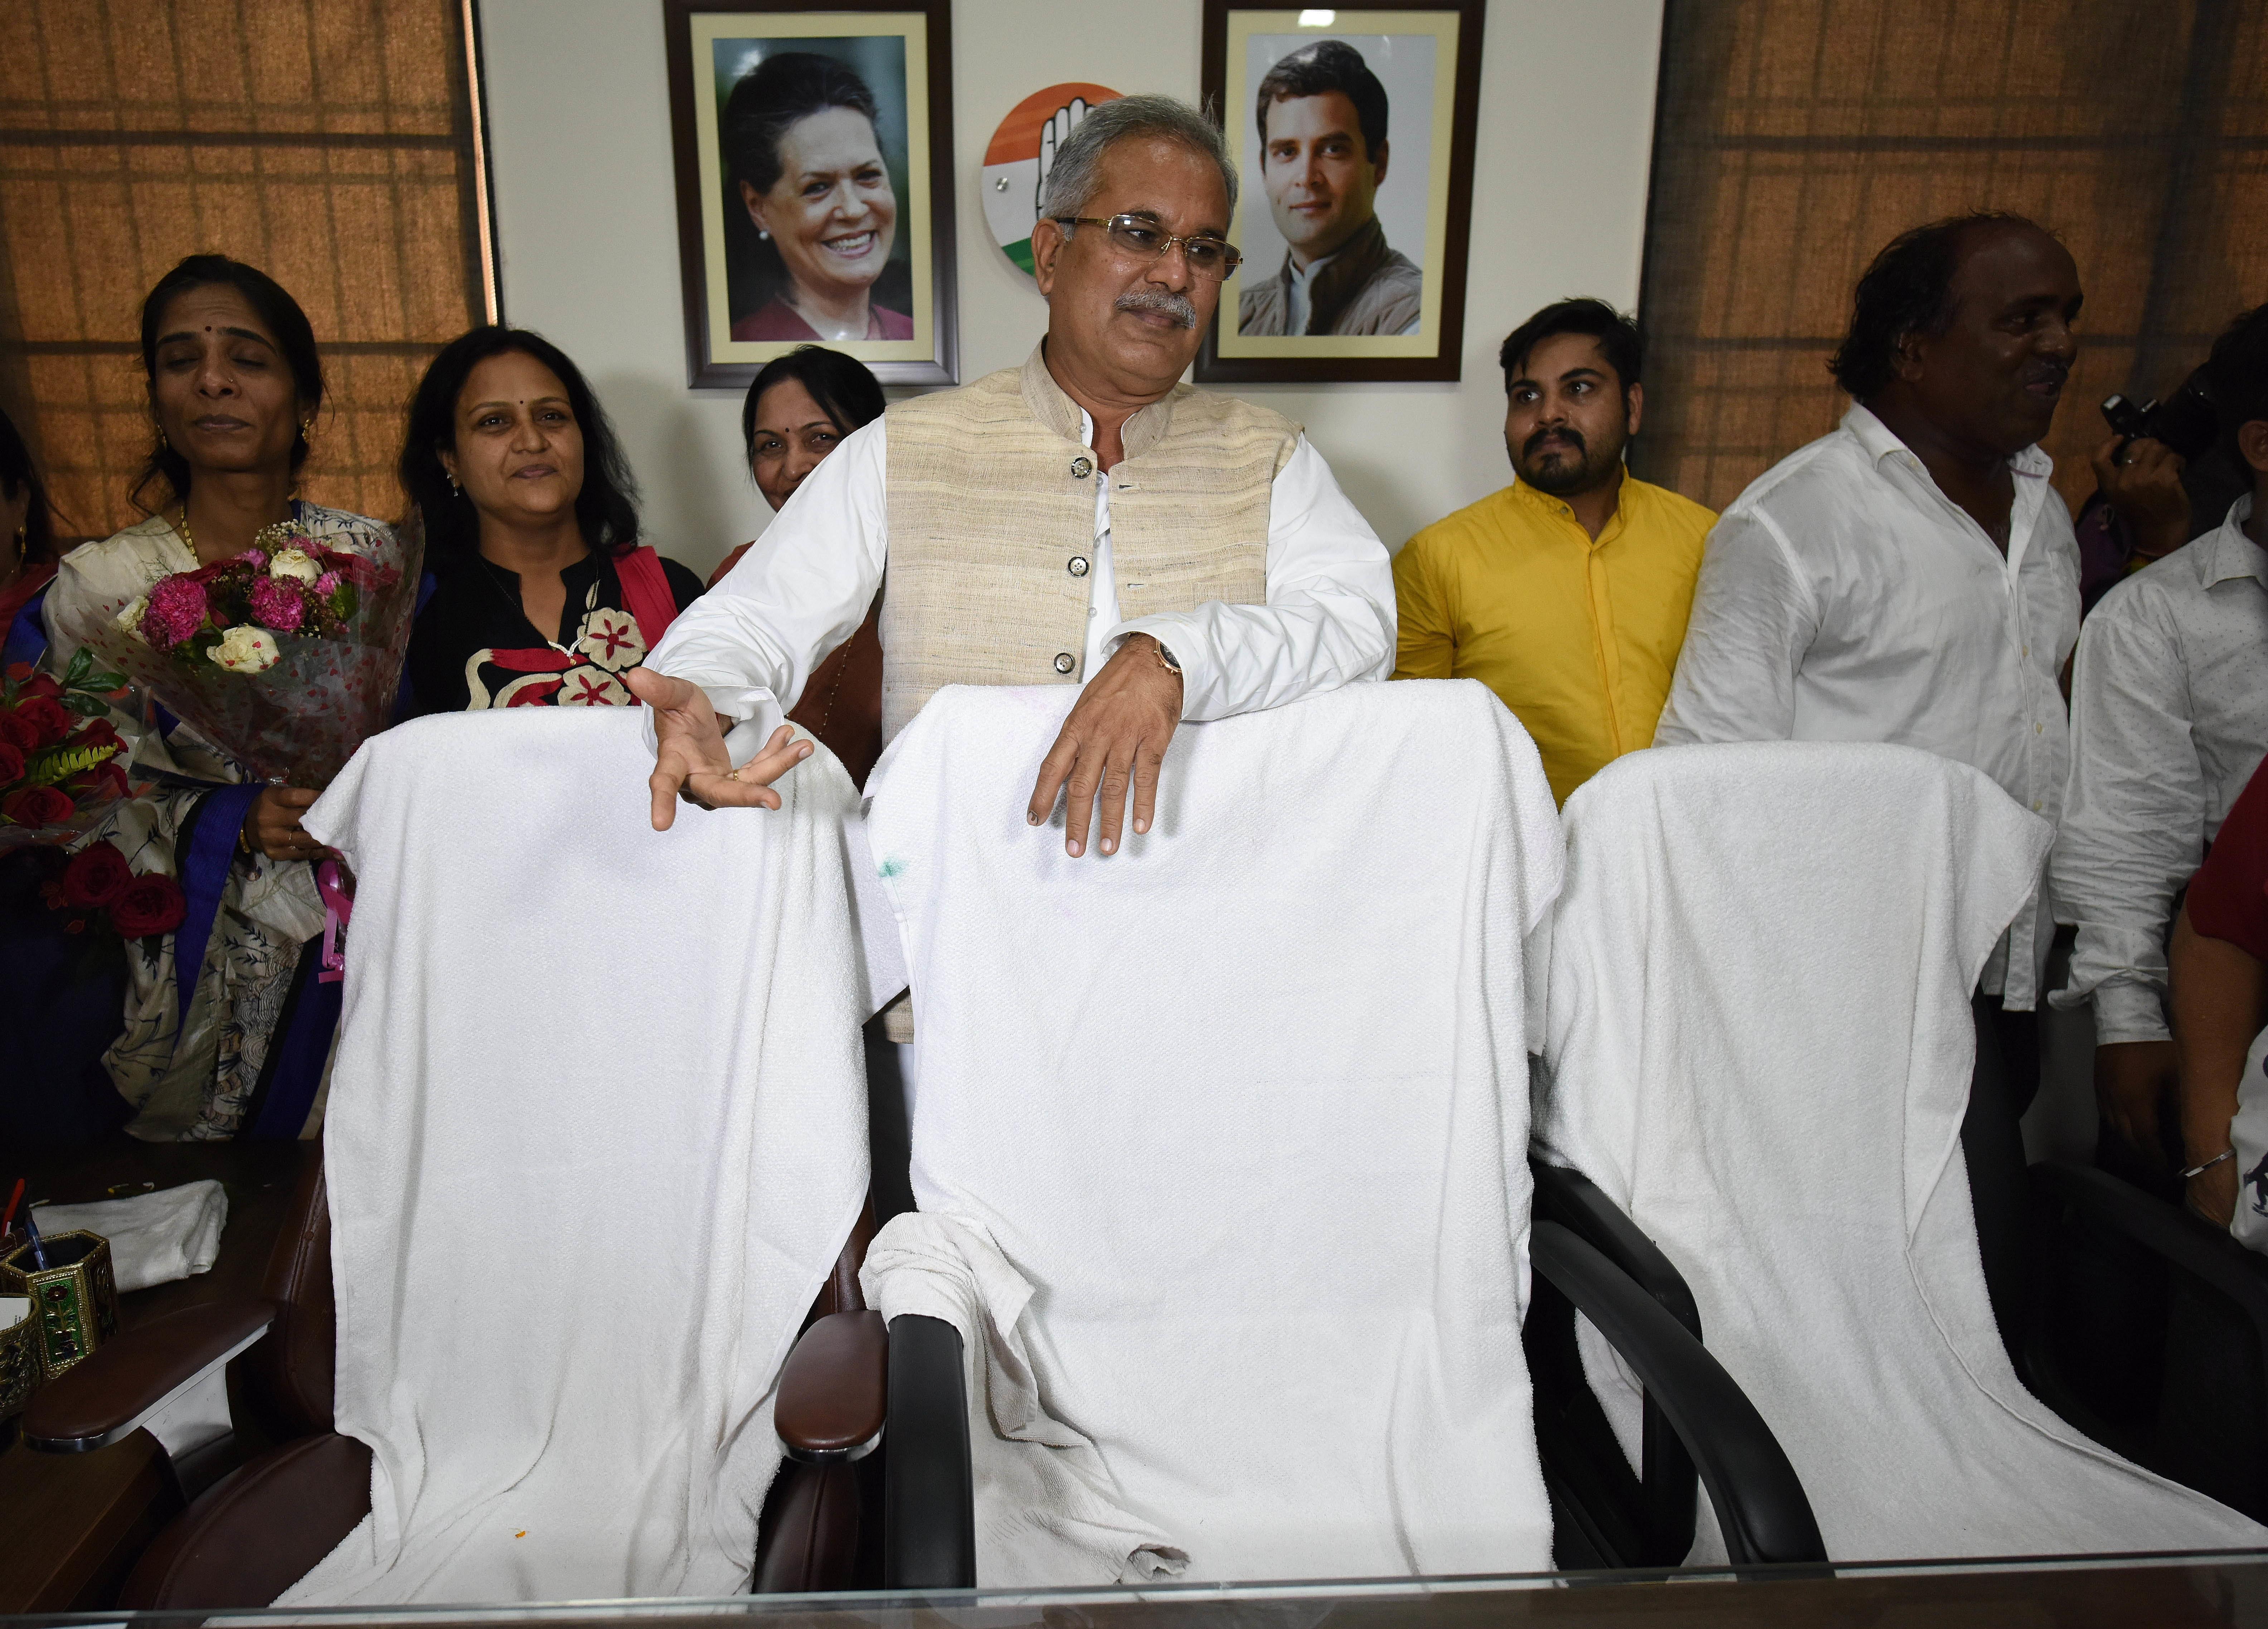 Major Bureaucratic Reshuffle In Chhattisgarh After Bhupesh Baghel Takes